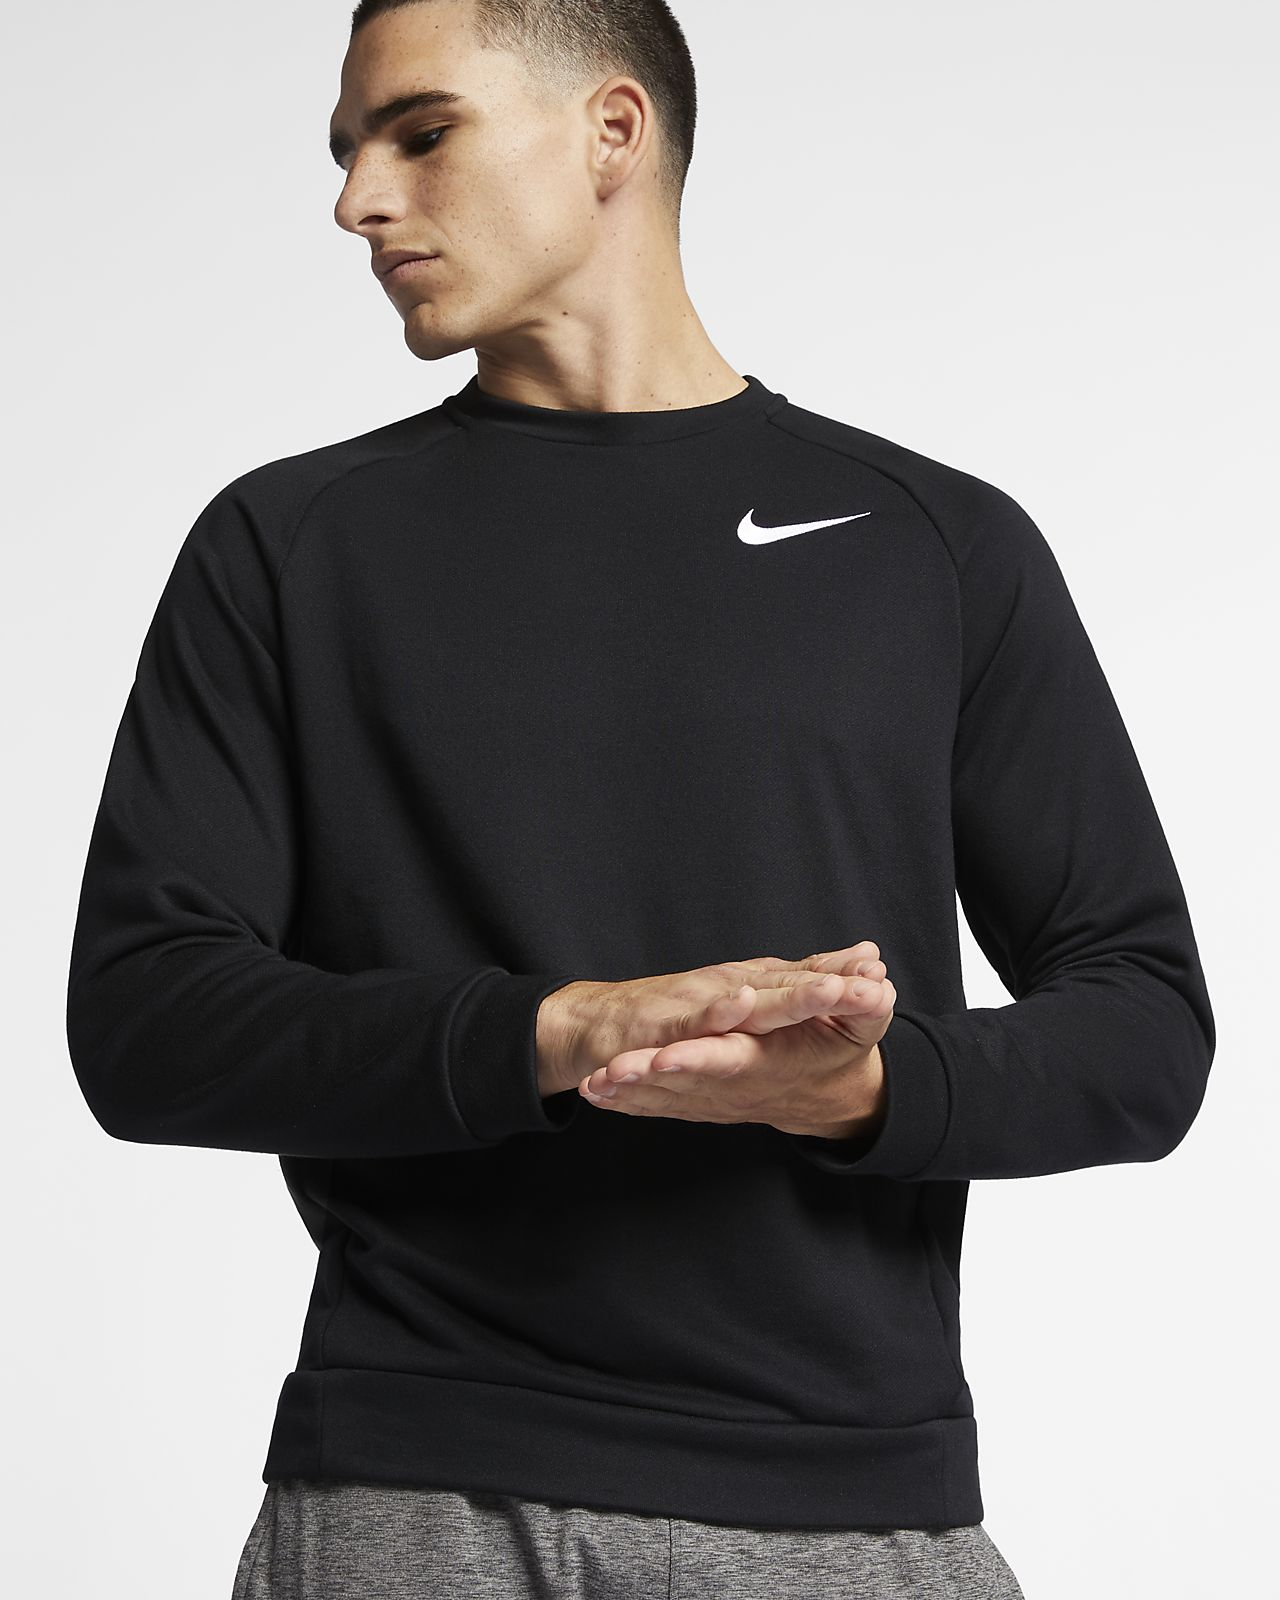 Nike Dri-FIT Men's Fleece Training Top